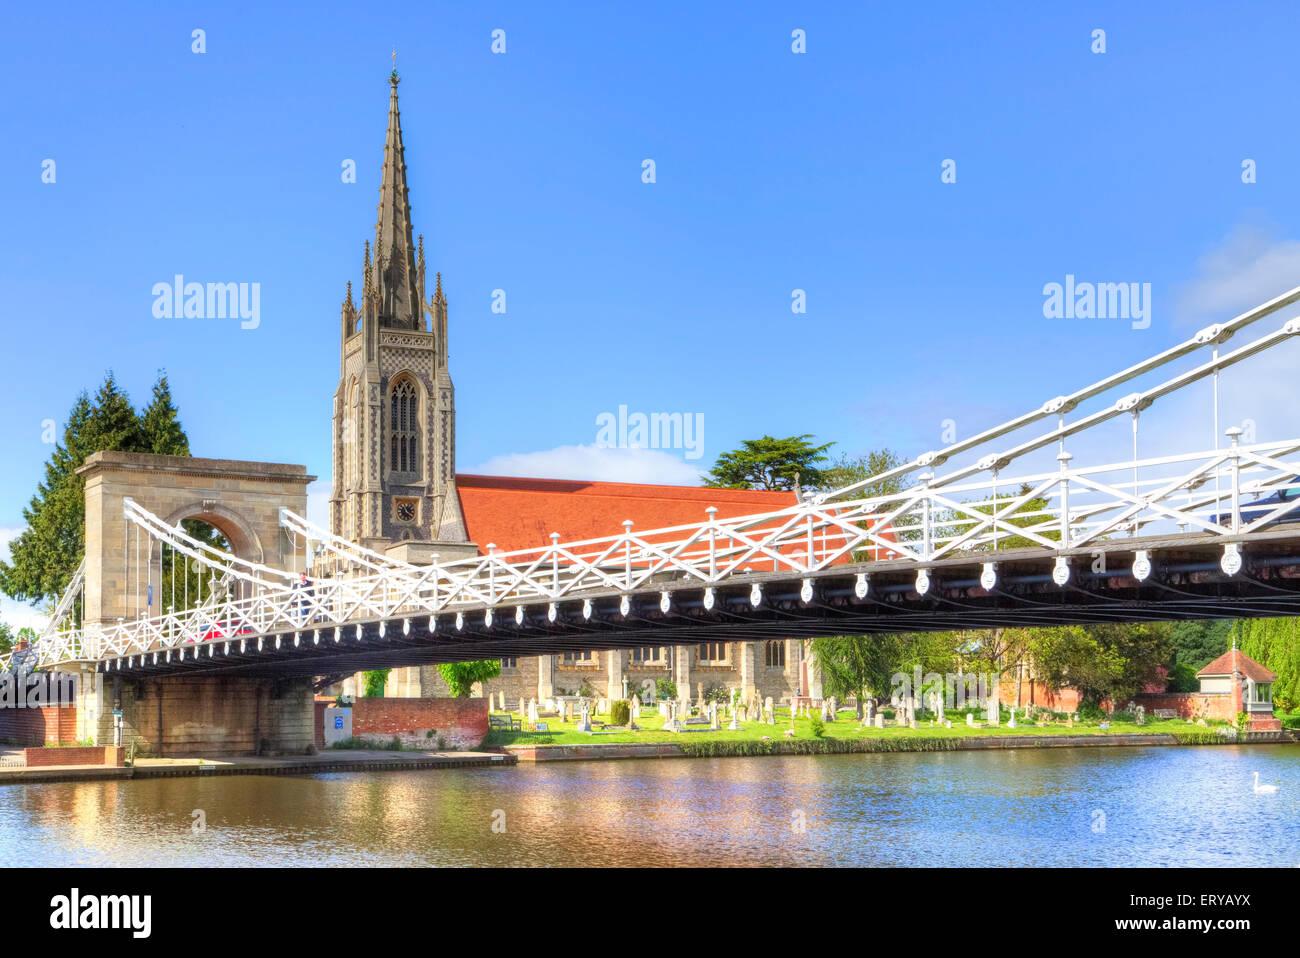 Marlow, Buckinghamshire, England, United Kingdom - Stock Image